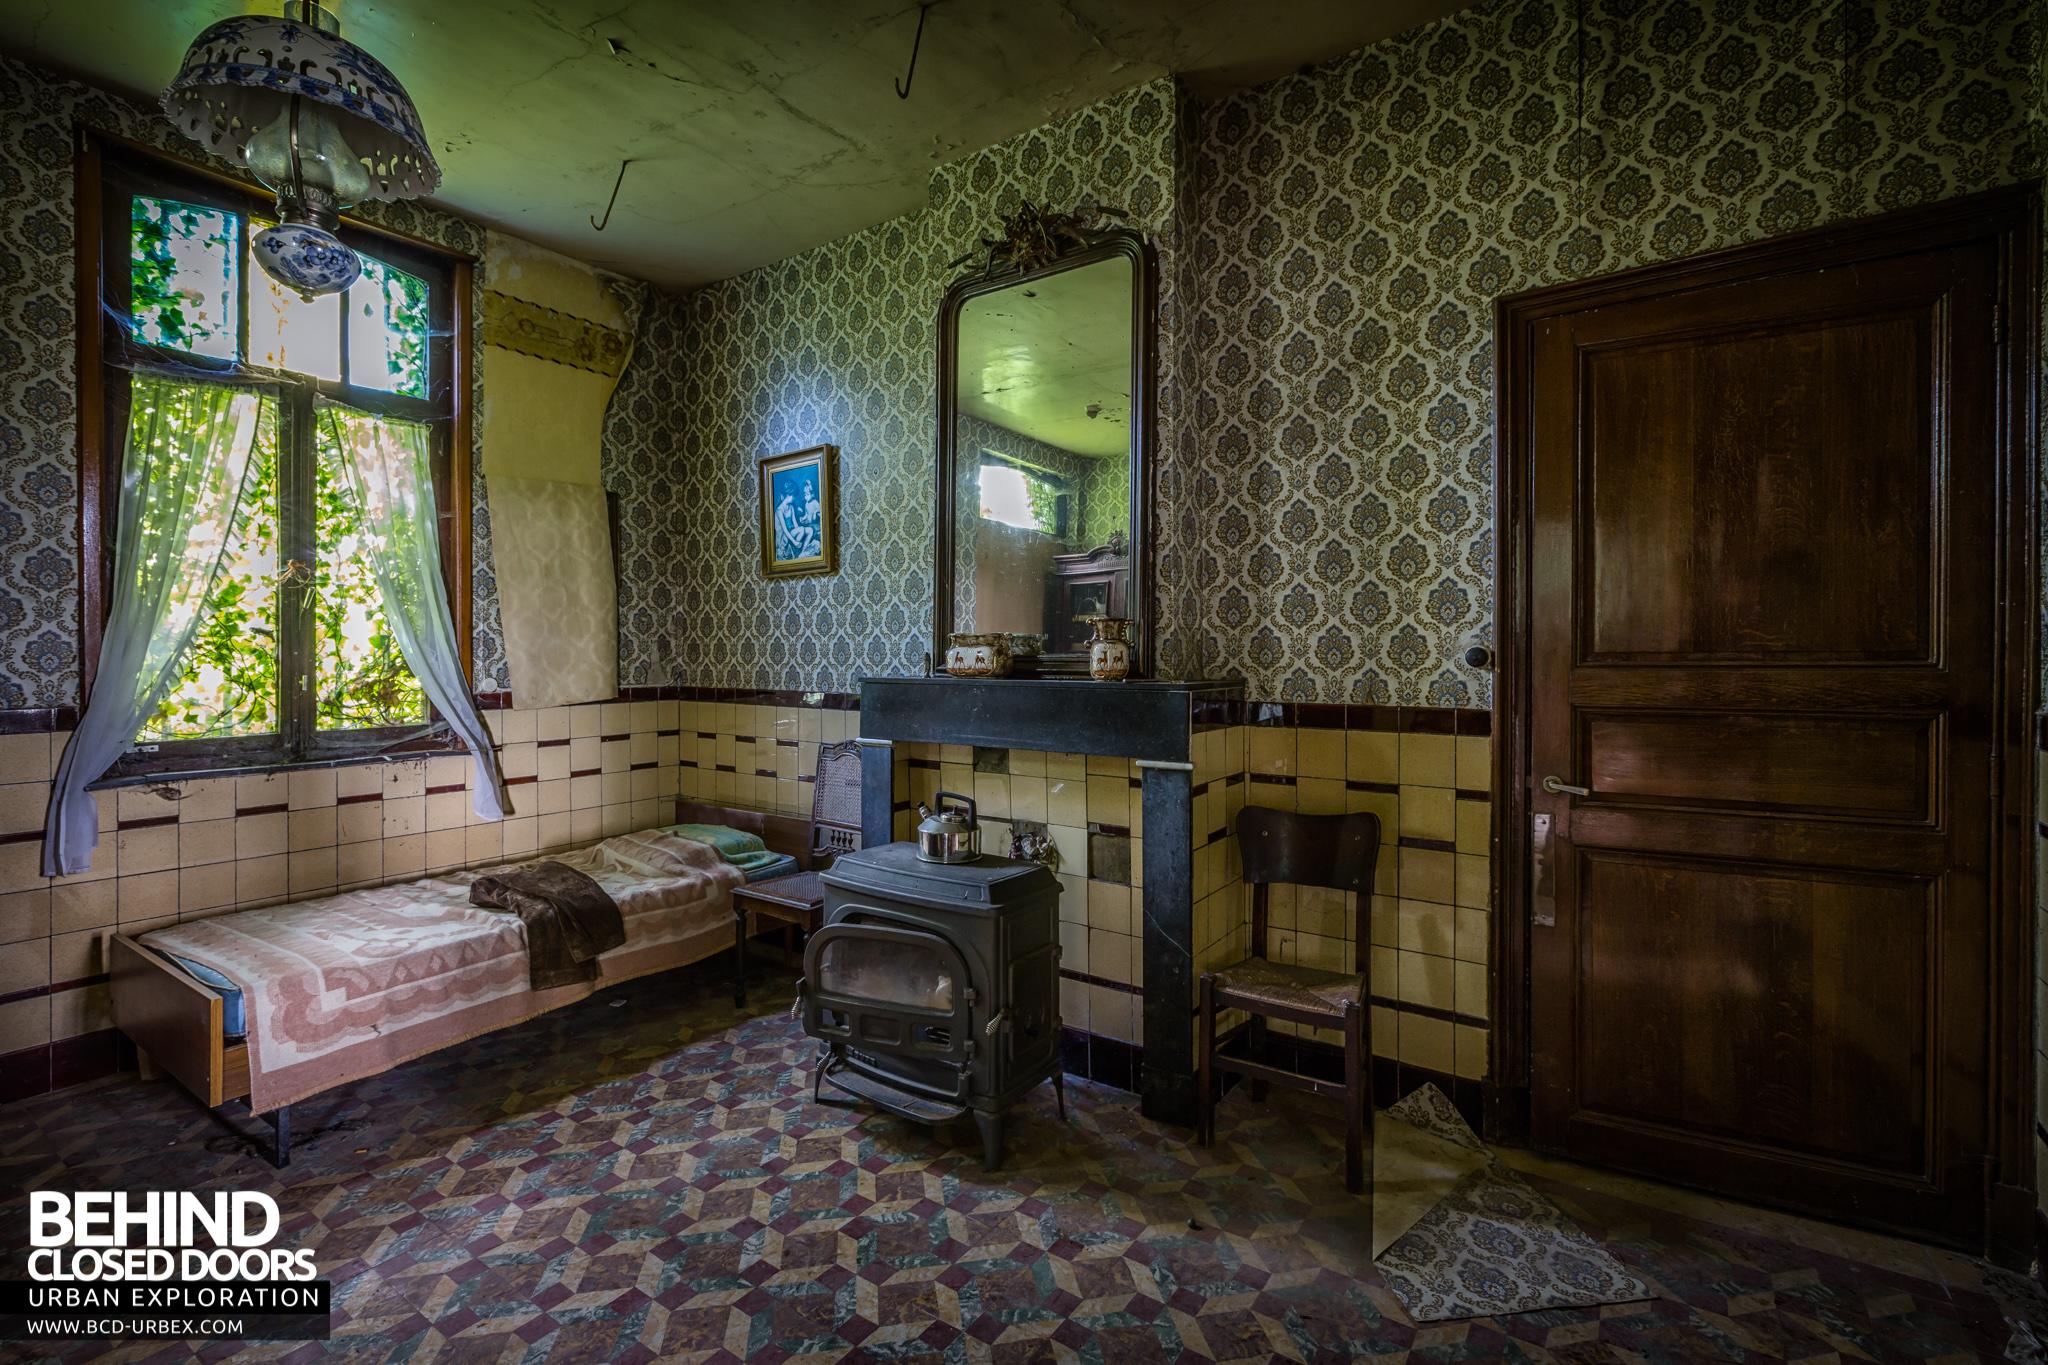 Maison Gustaaf Abandoned House Belgium Urbex Behind Closed Doors Urban Exploring Abandoned